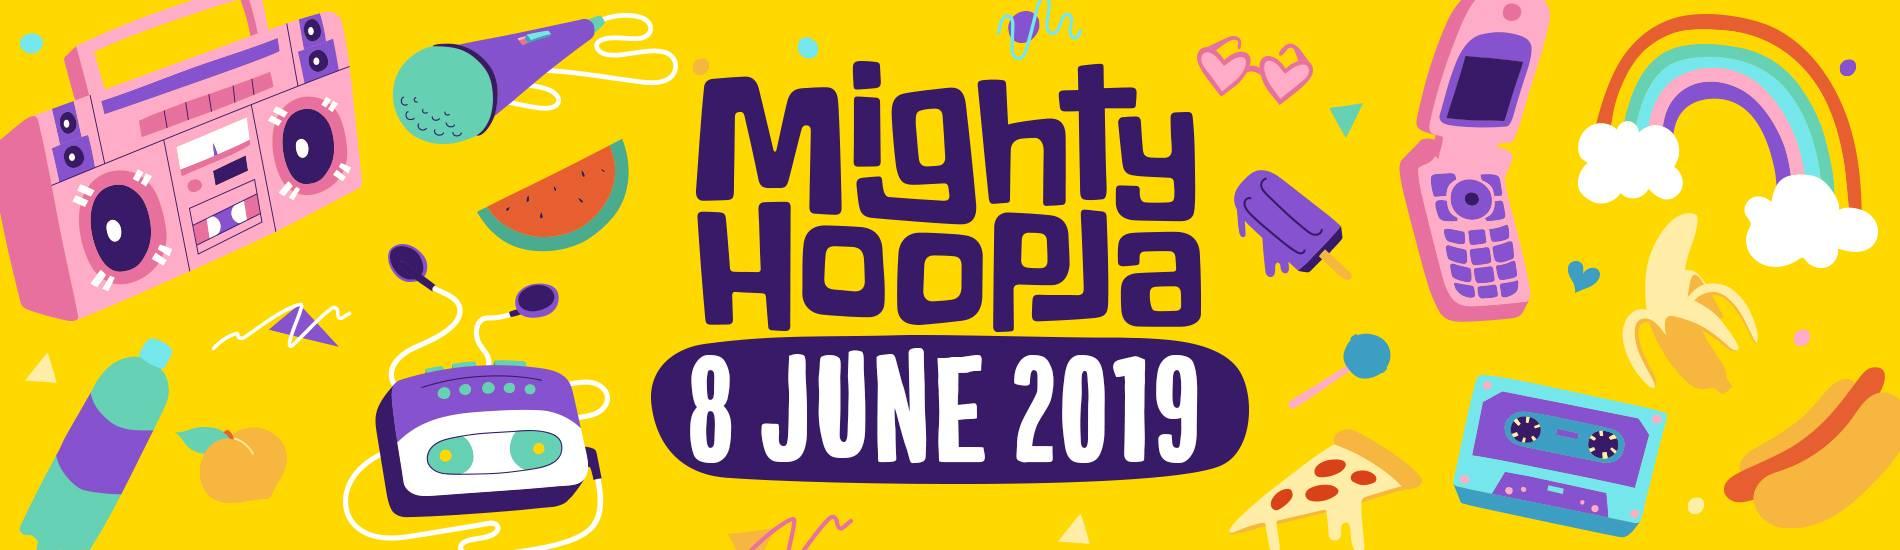 Mighty Hoopla 2019